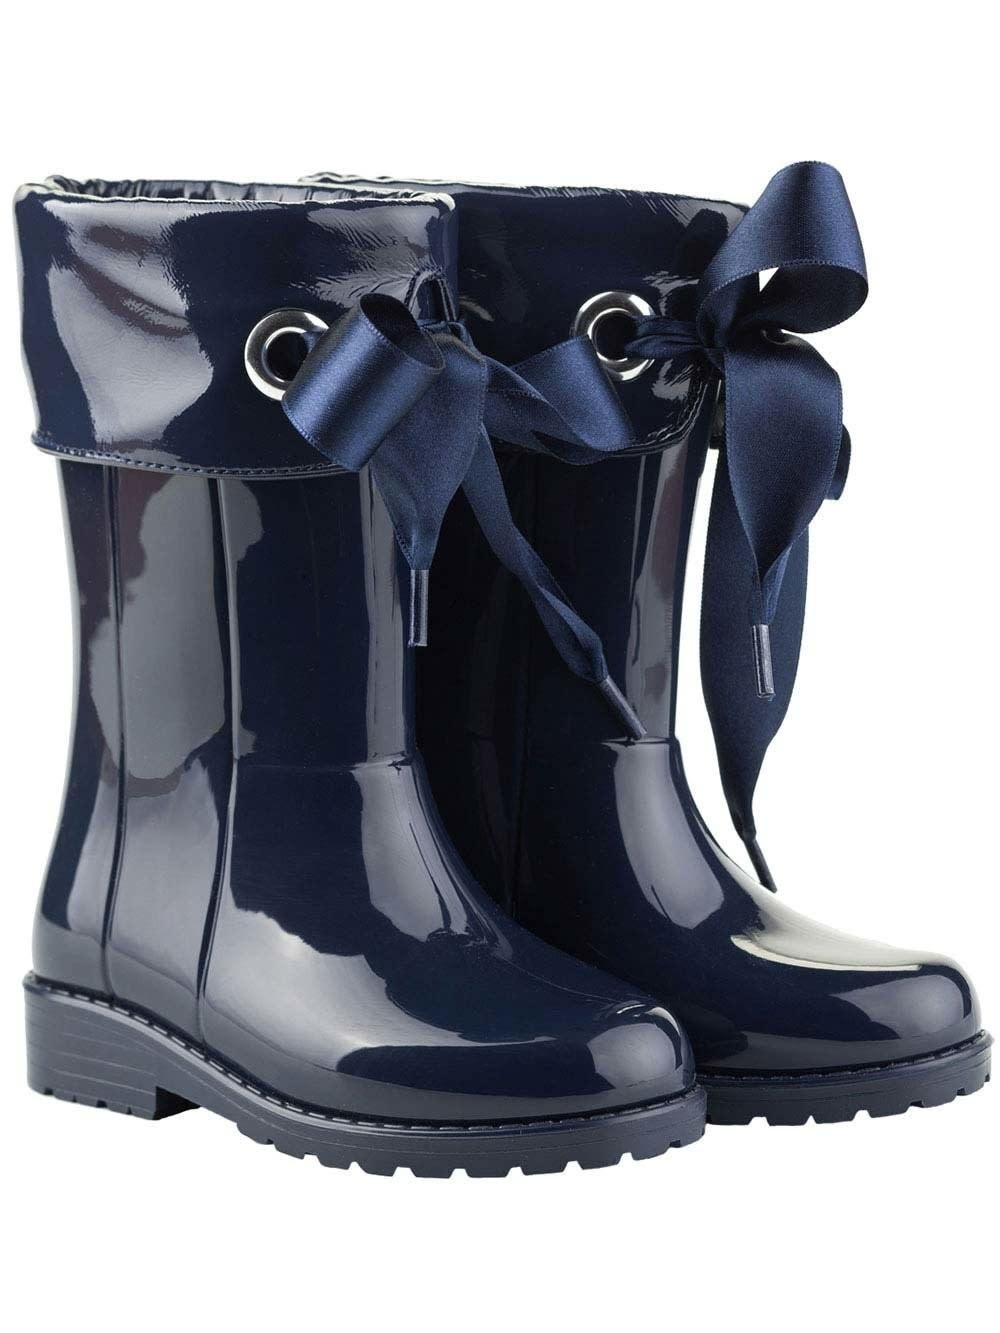 igor Igor Campera Ribbon Tie Rainboot - Navy